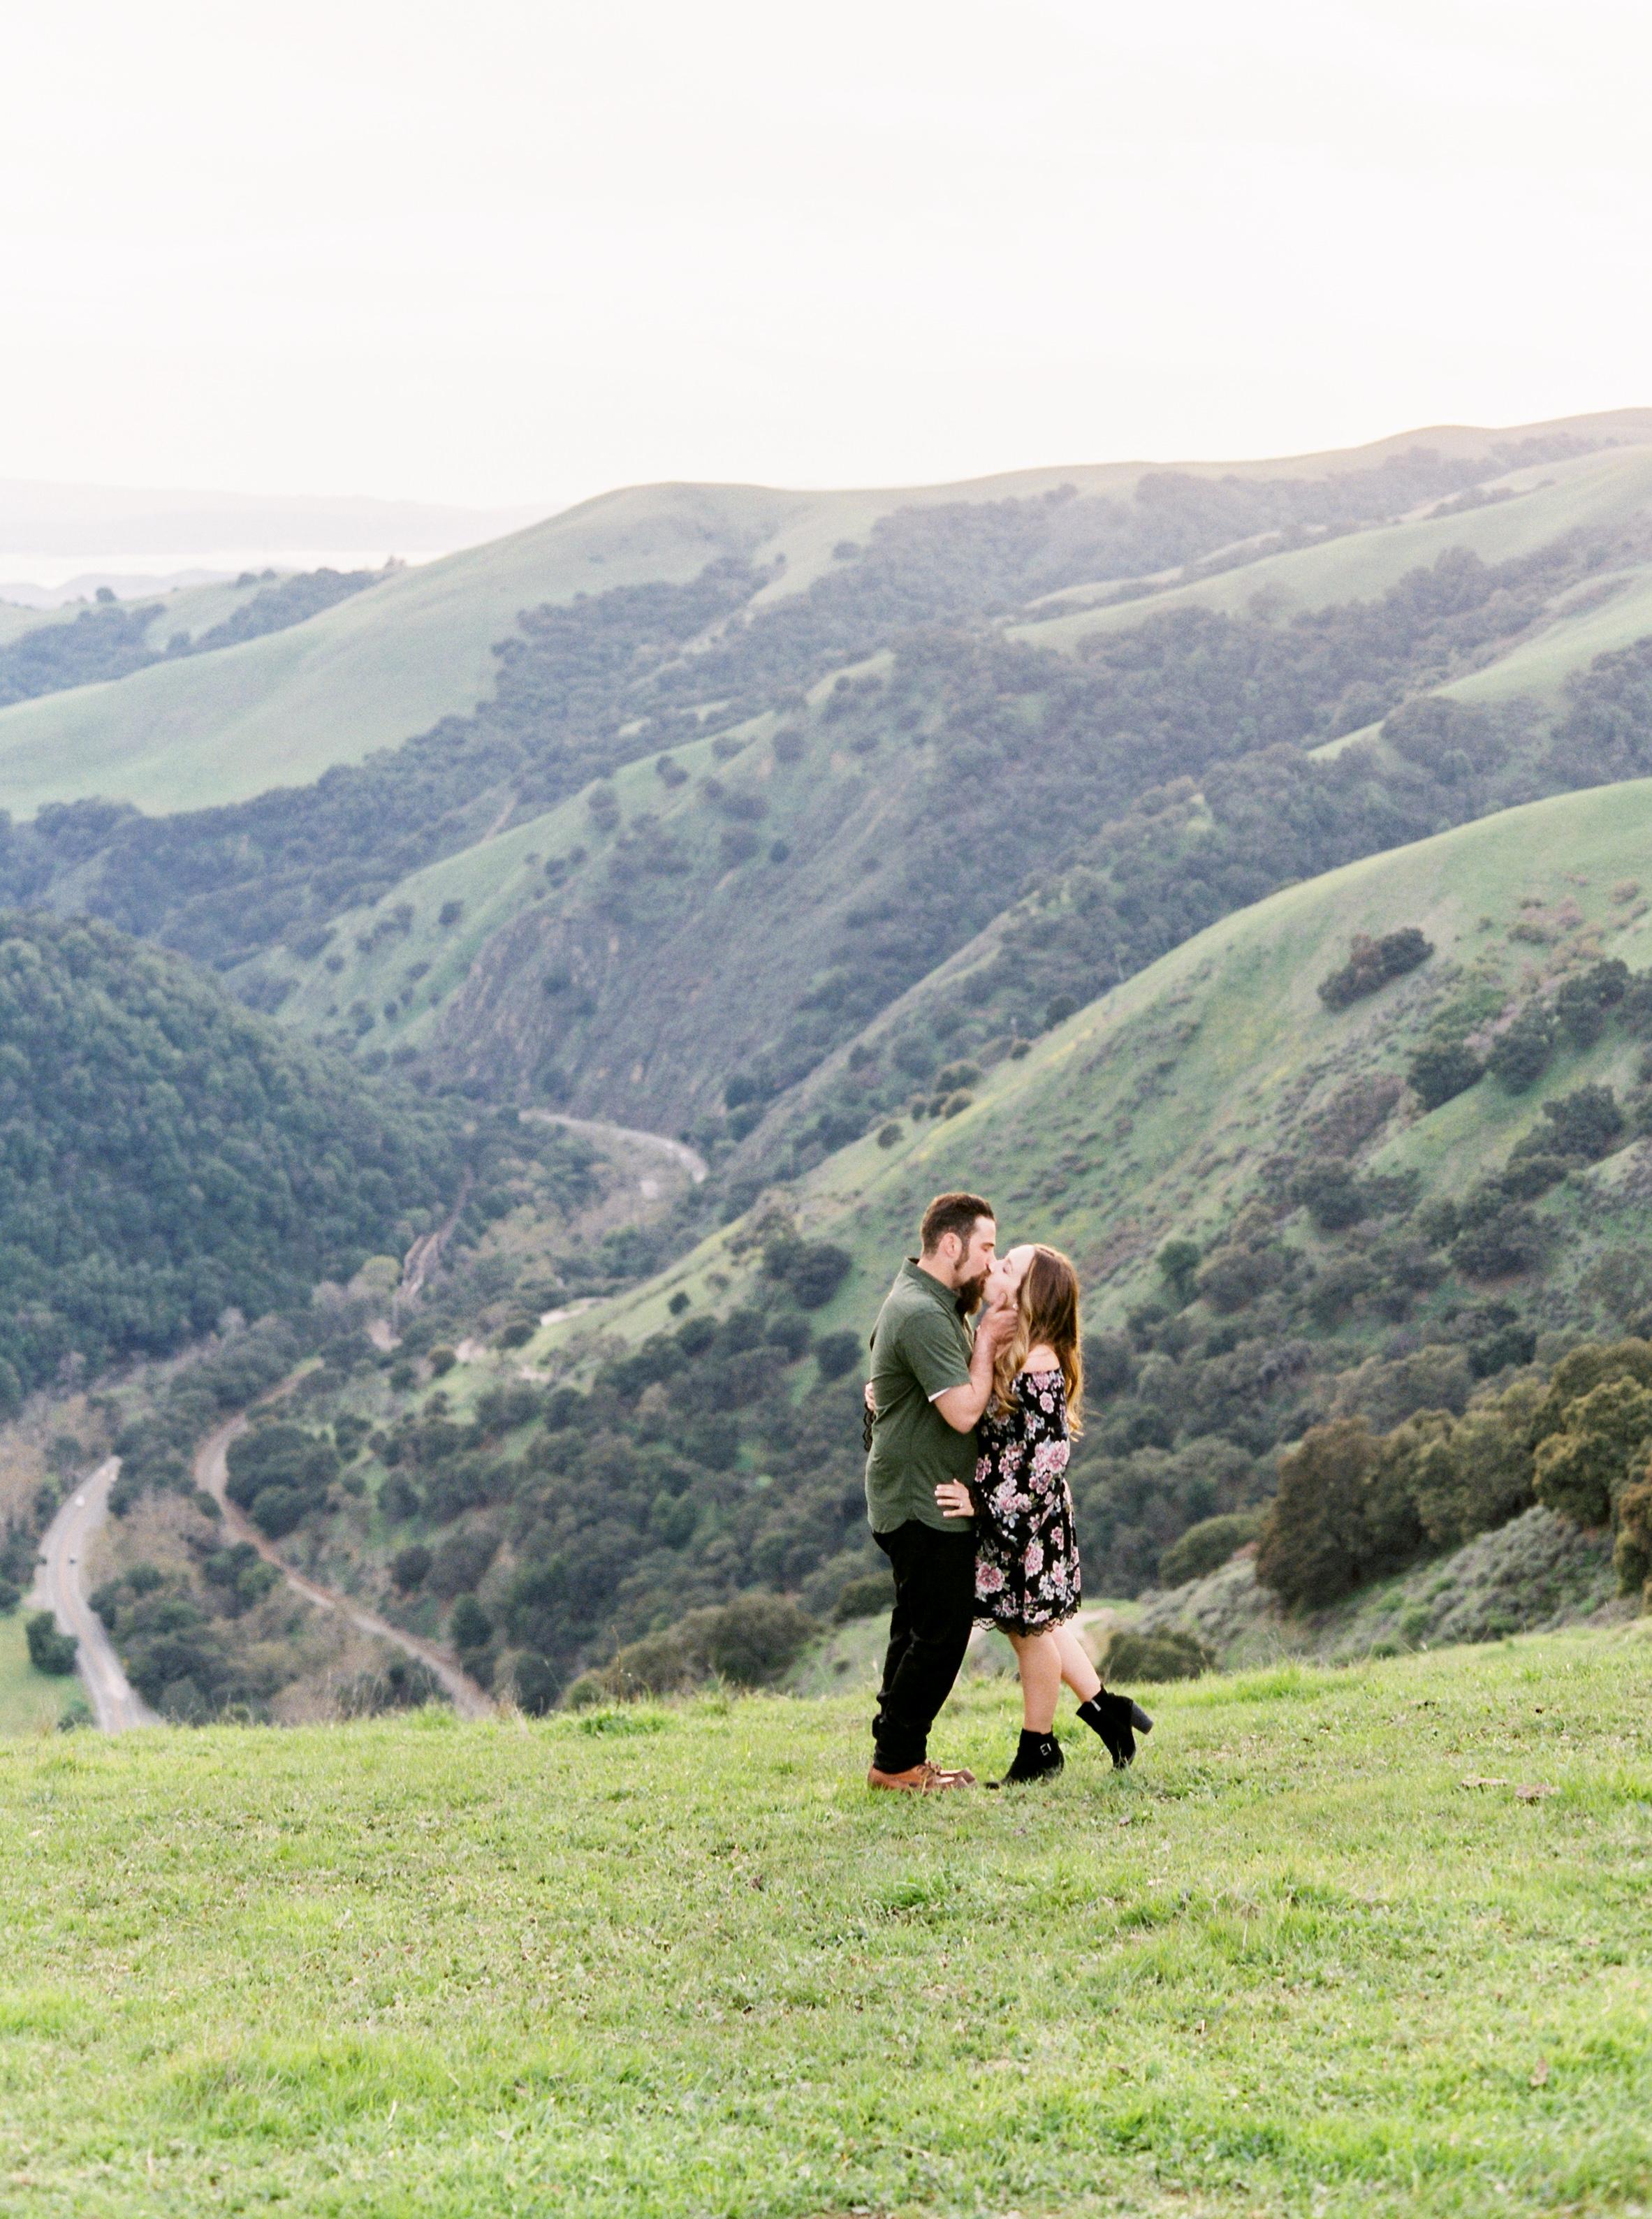 Sunol California Engagement Shoot - Kristine Herman Photography-20.jpg